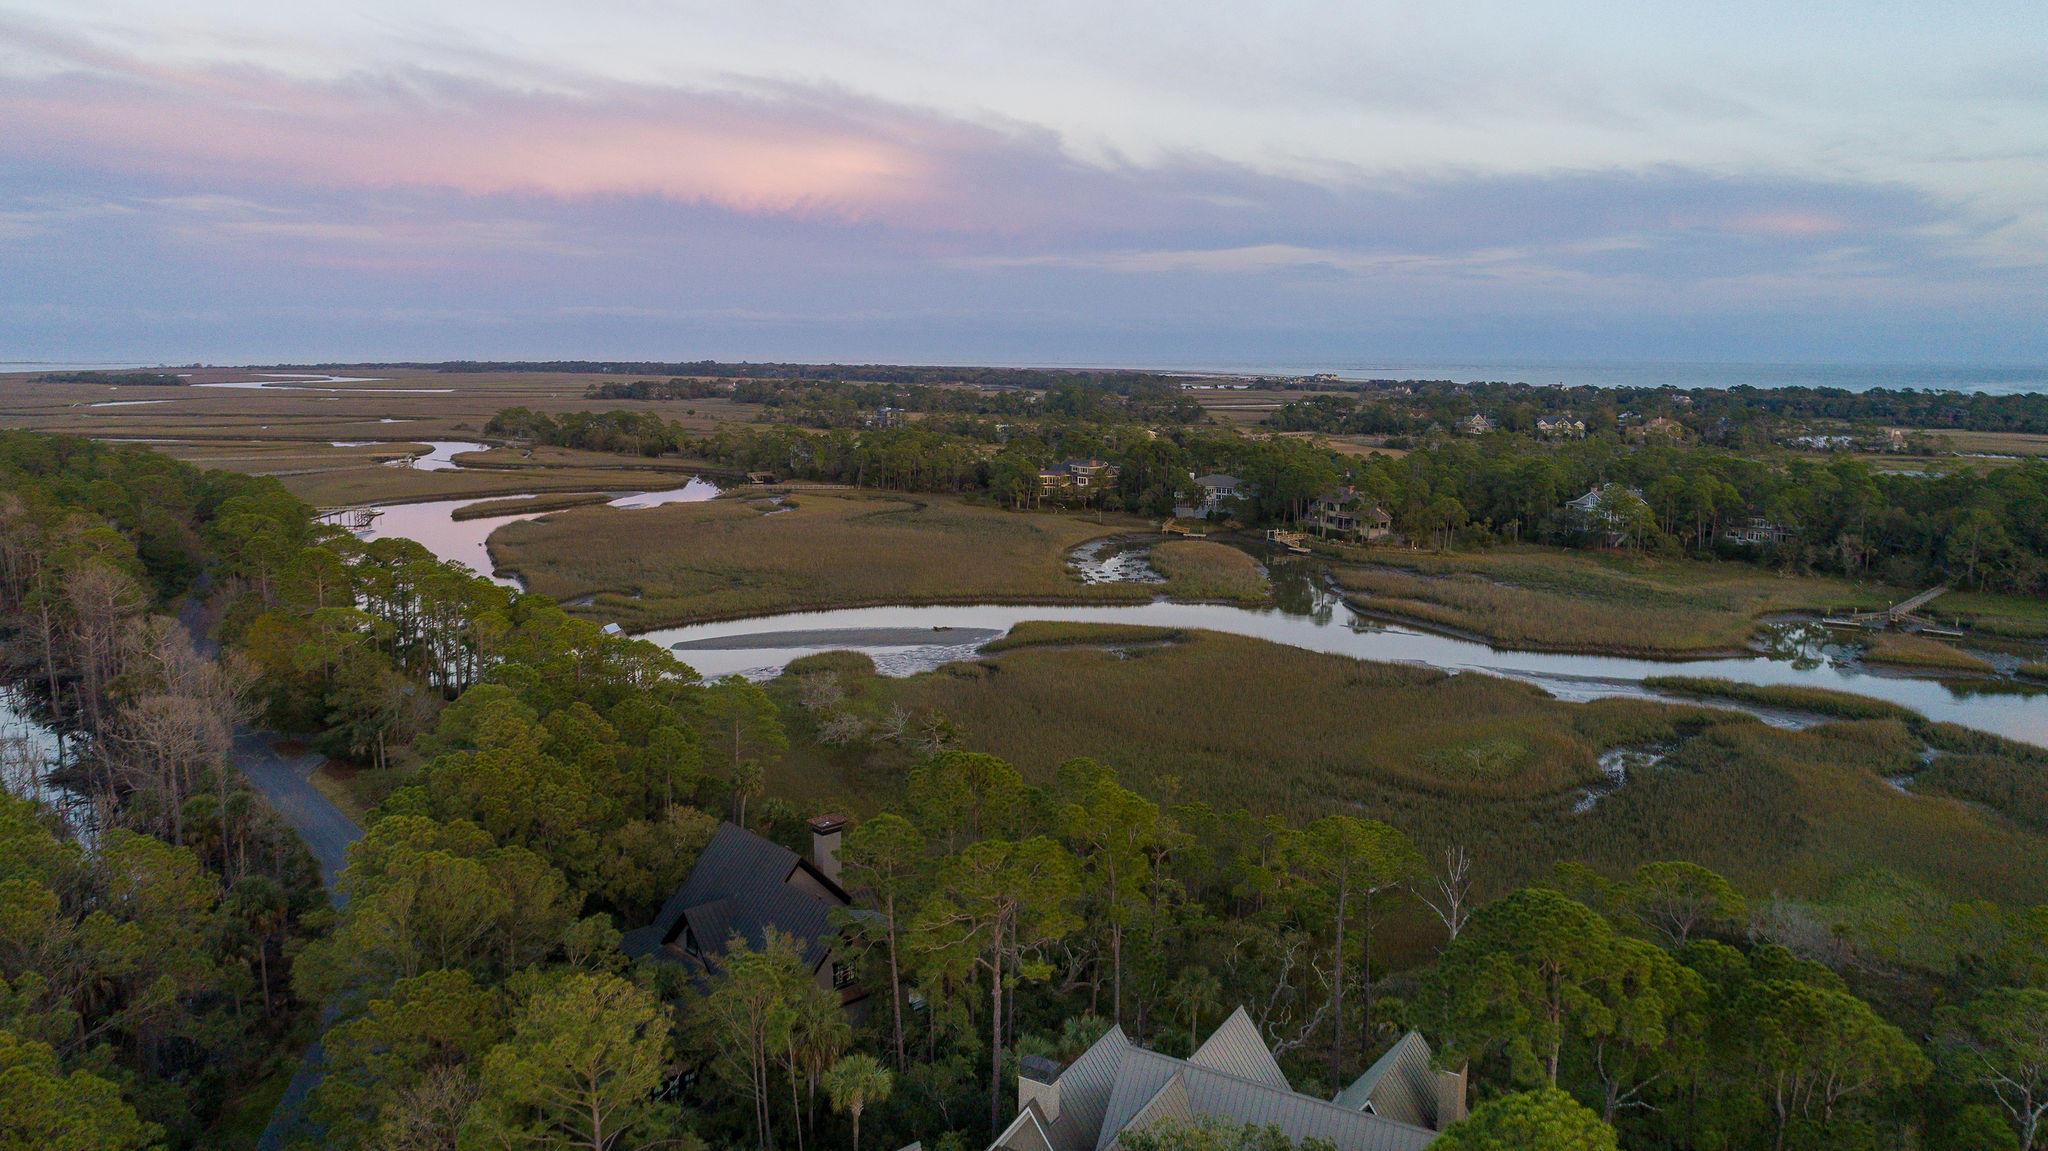 Kiawah Island Homes For Sale - 3 Grey Widgeon, Kiawah Island, SC - 56